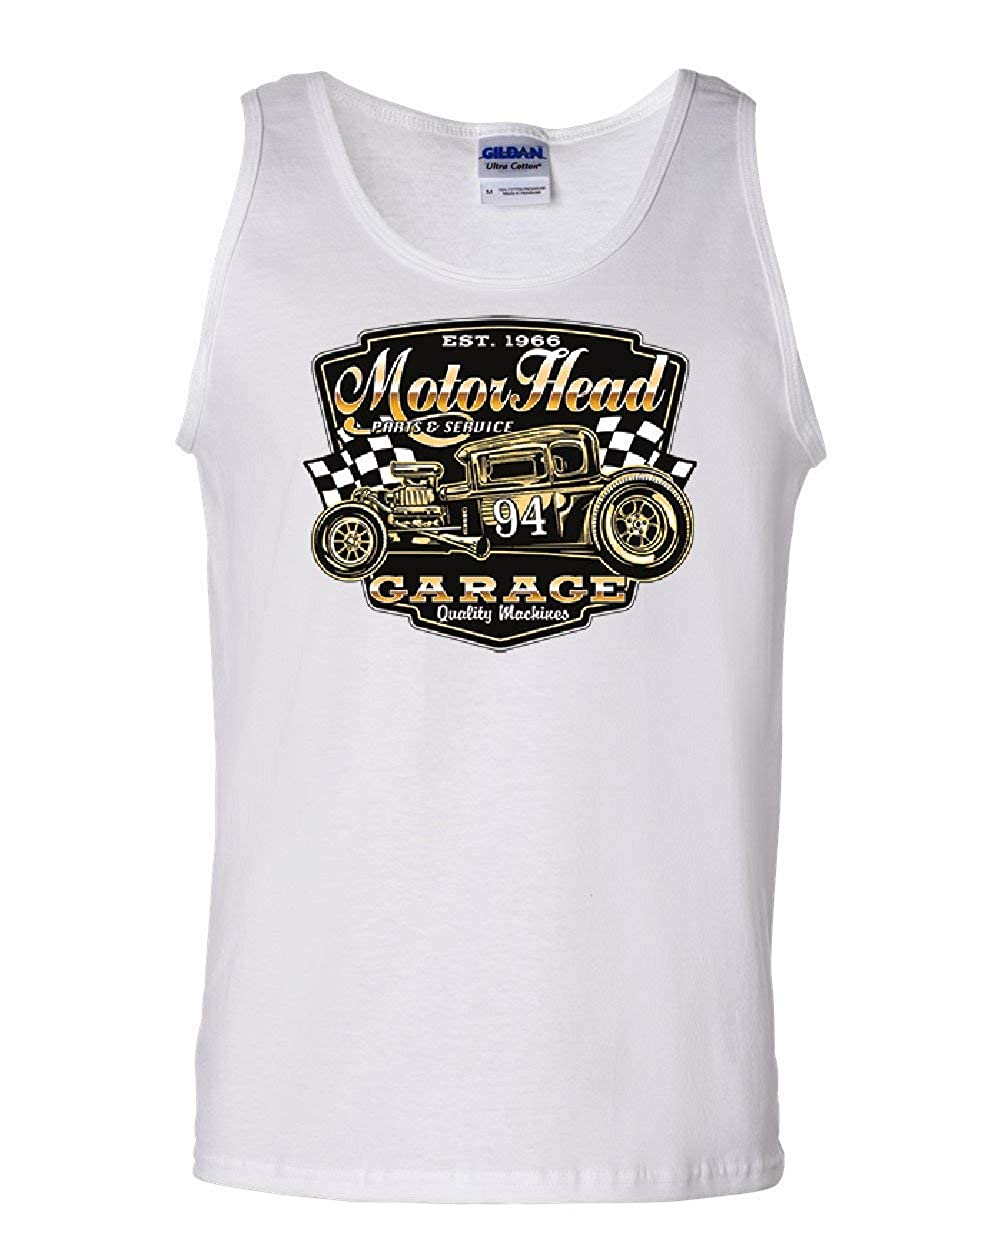 Motorhead Garage Tank Top Route 66 Hot Rod American Classic Retro Sleeveless